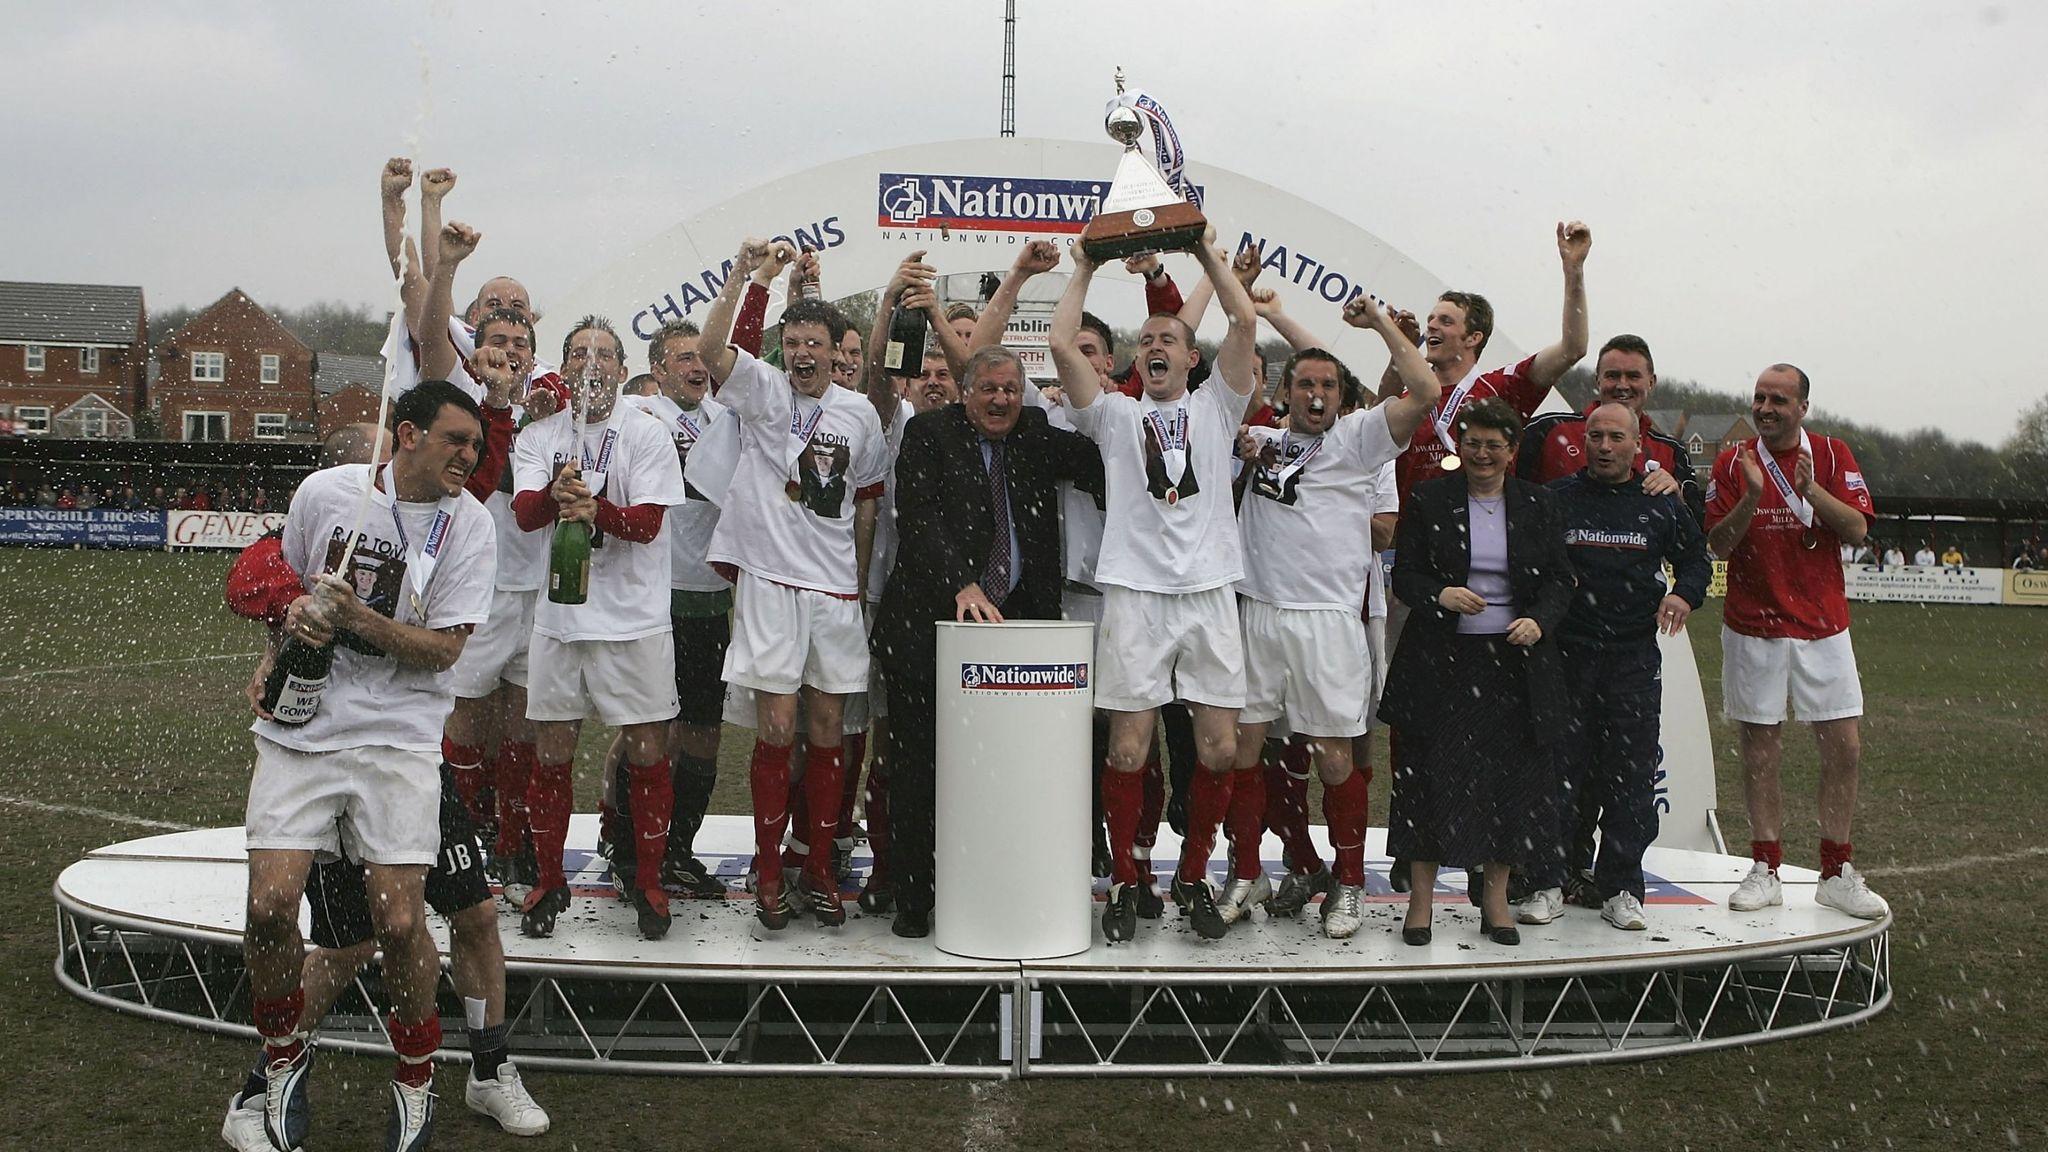 John Coleman still dreaming of Accrington Stanley success after odds-defying run